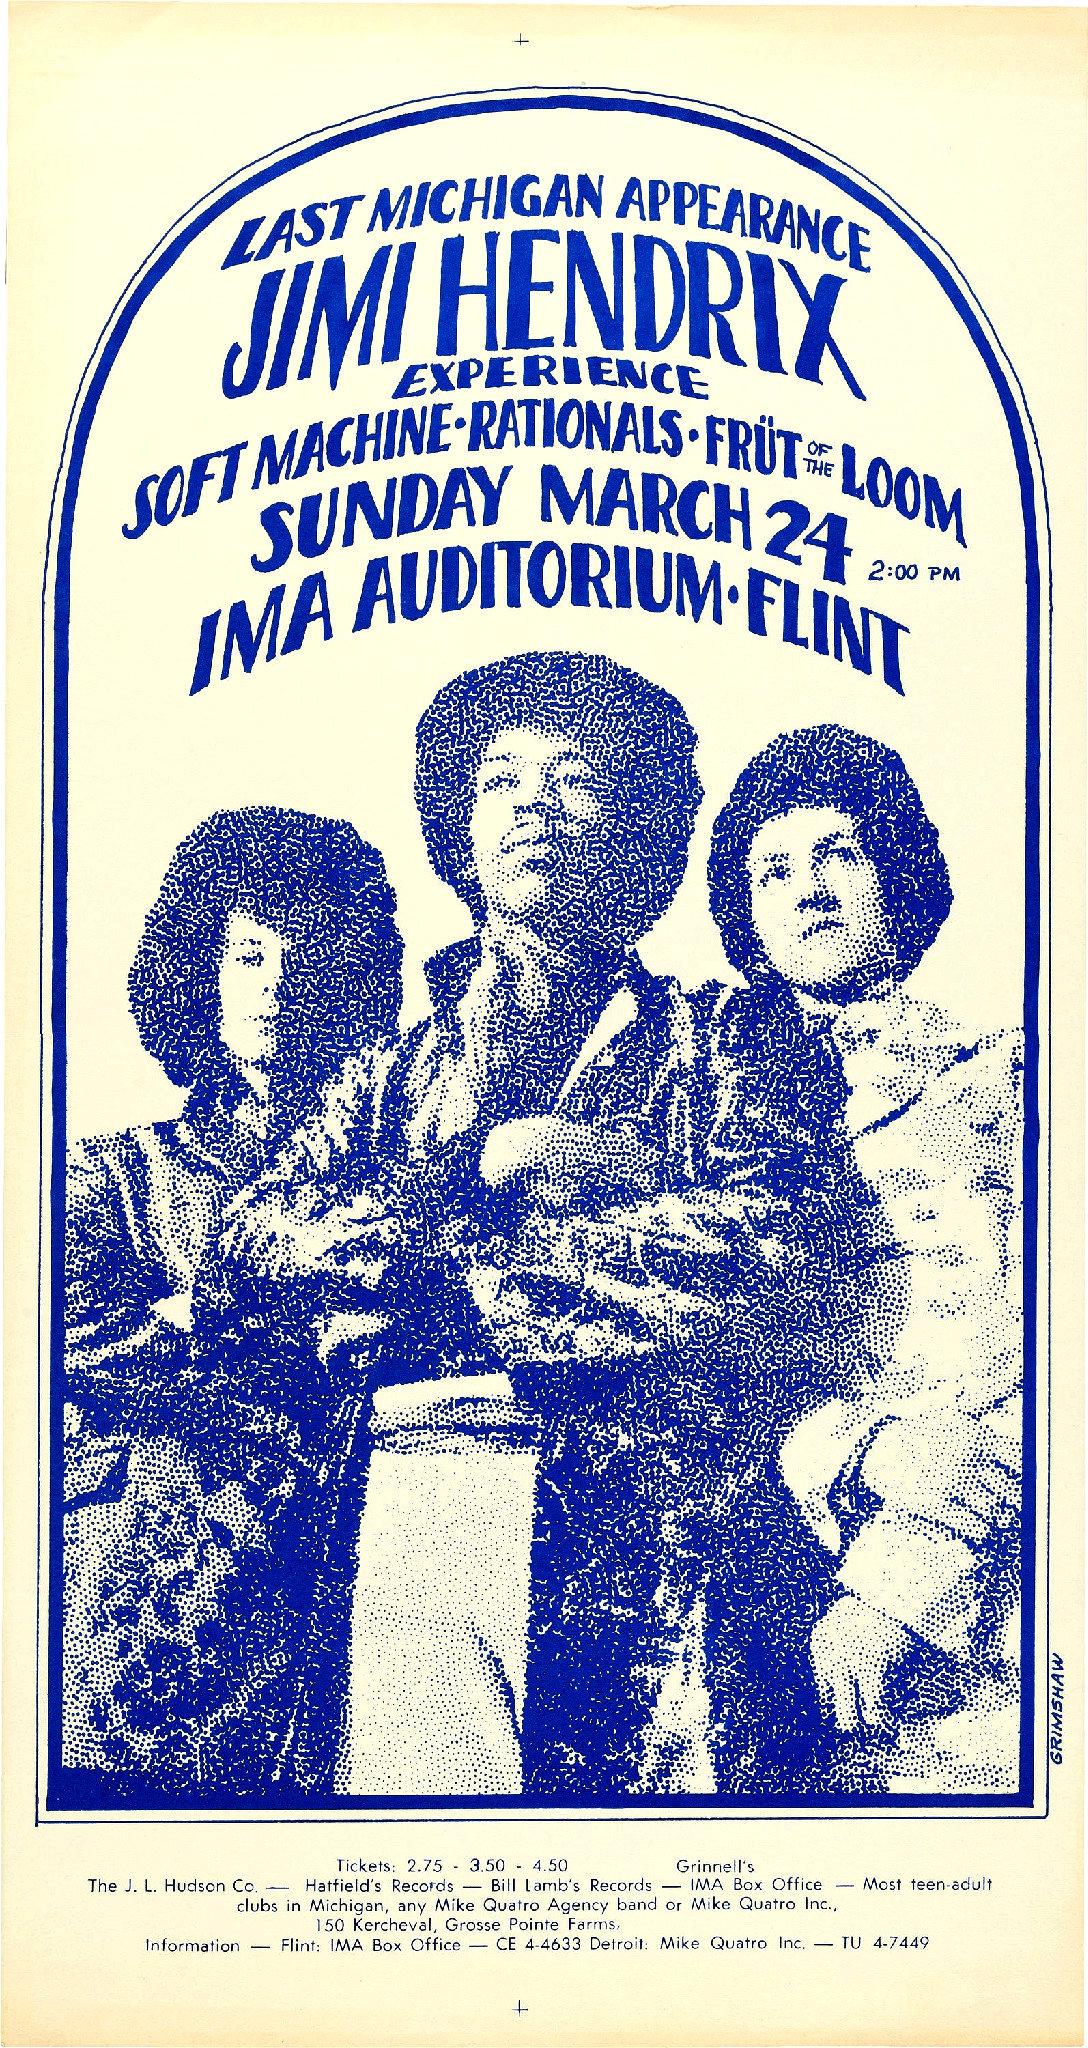 FileJimi Hendrix Experience IMA Auditorium Flint 1968 Poster